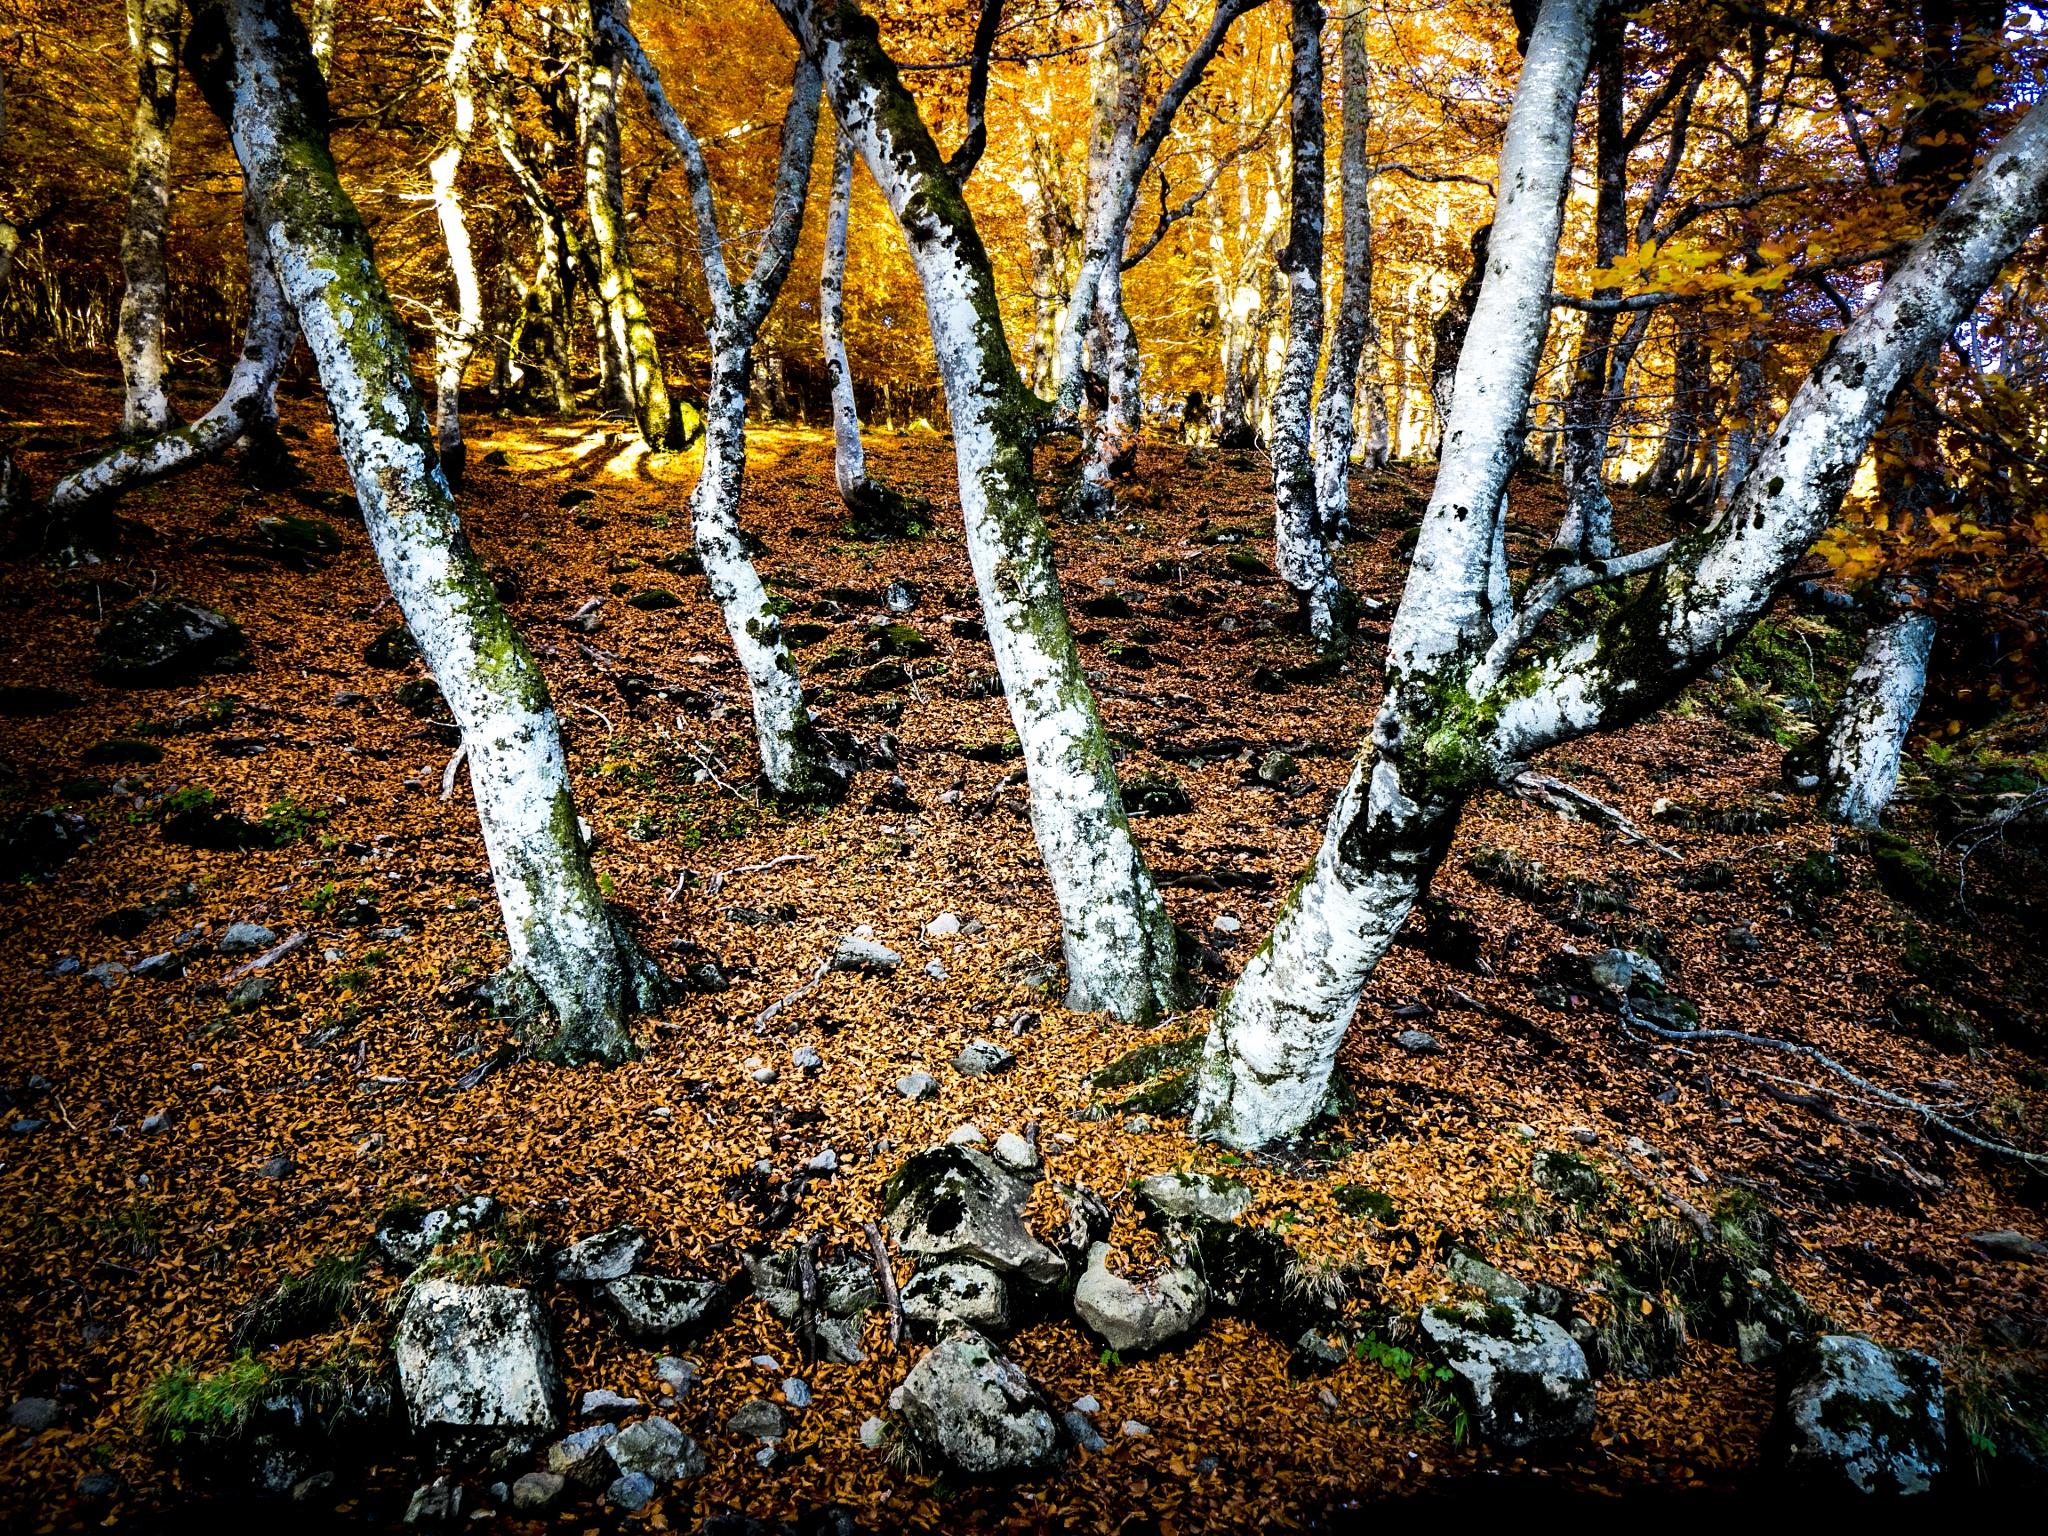 beeches undergrowth by Erik Jaud